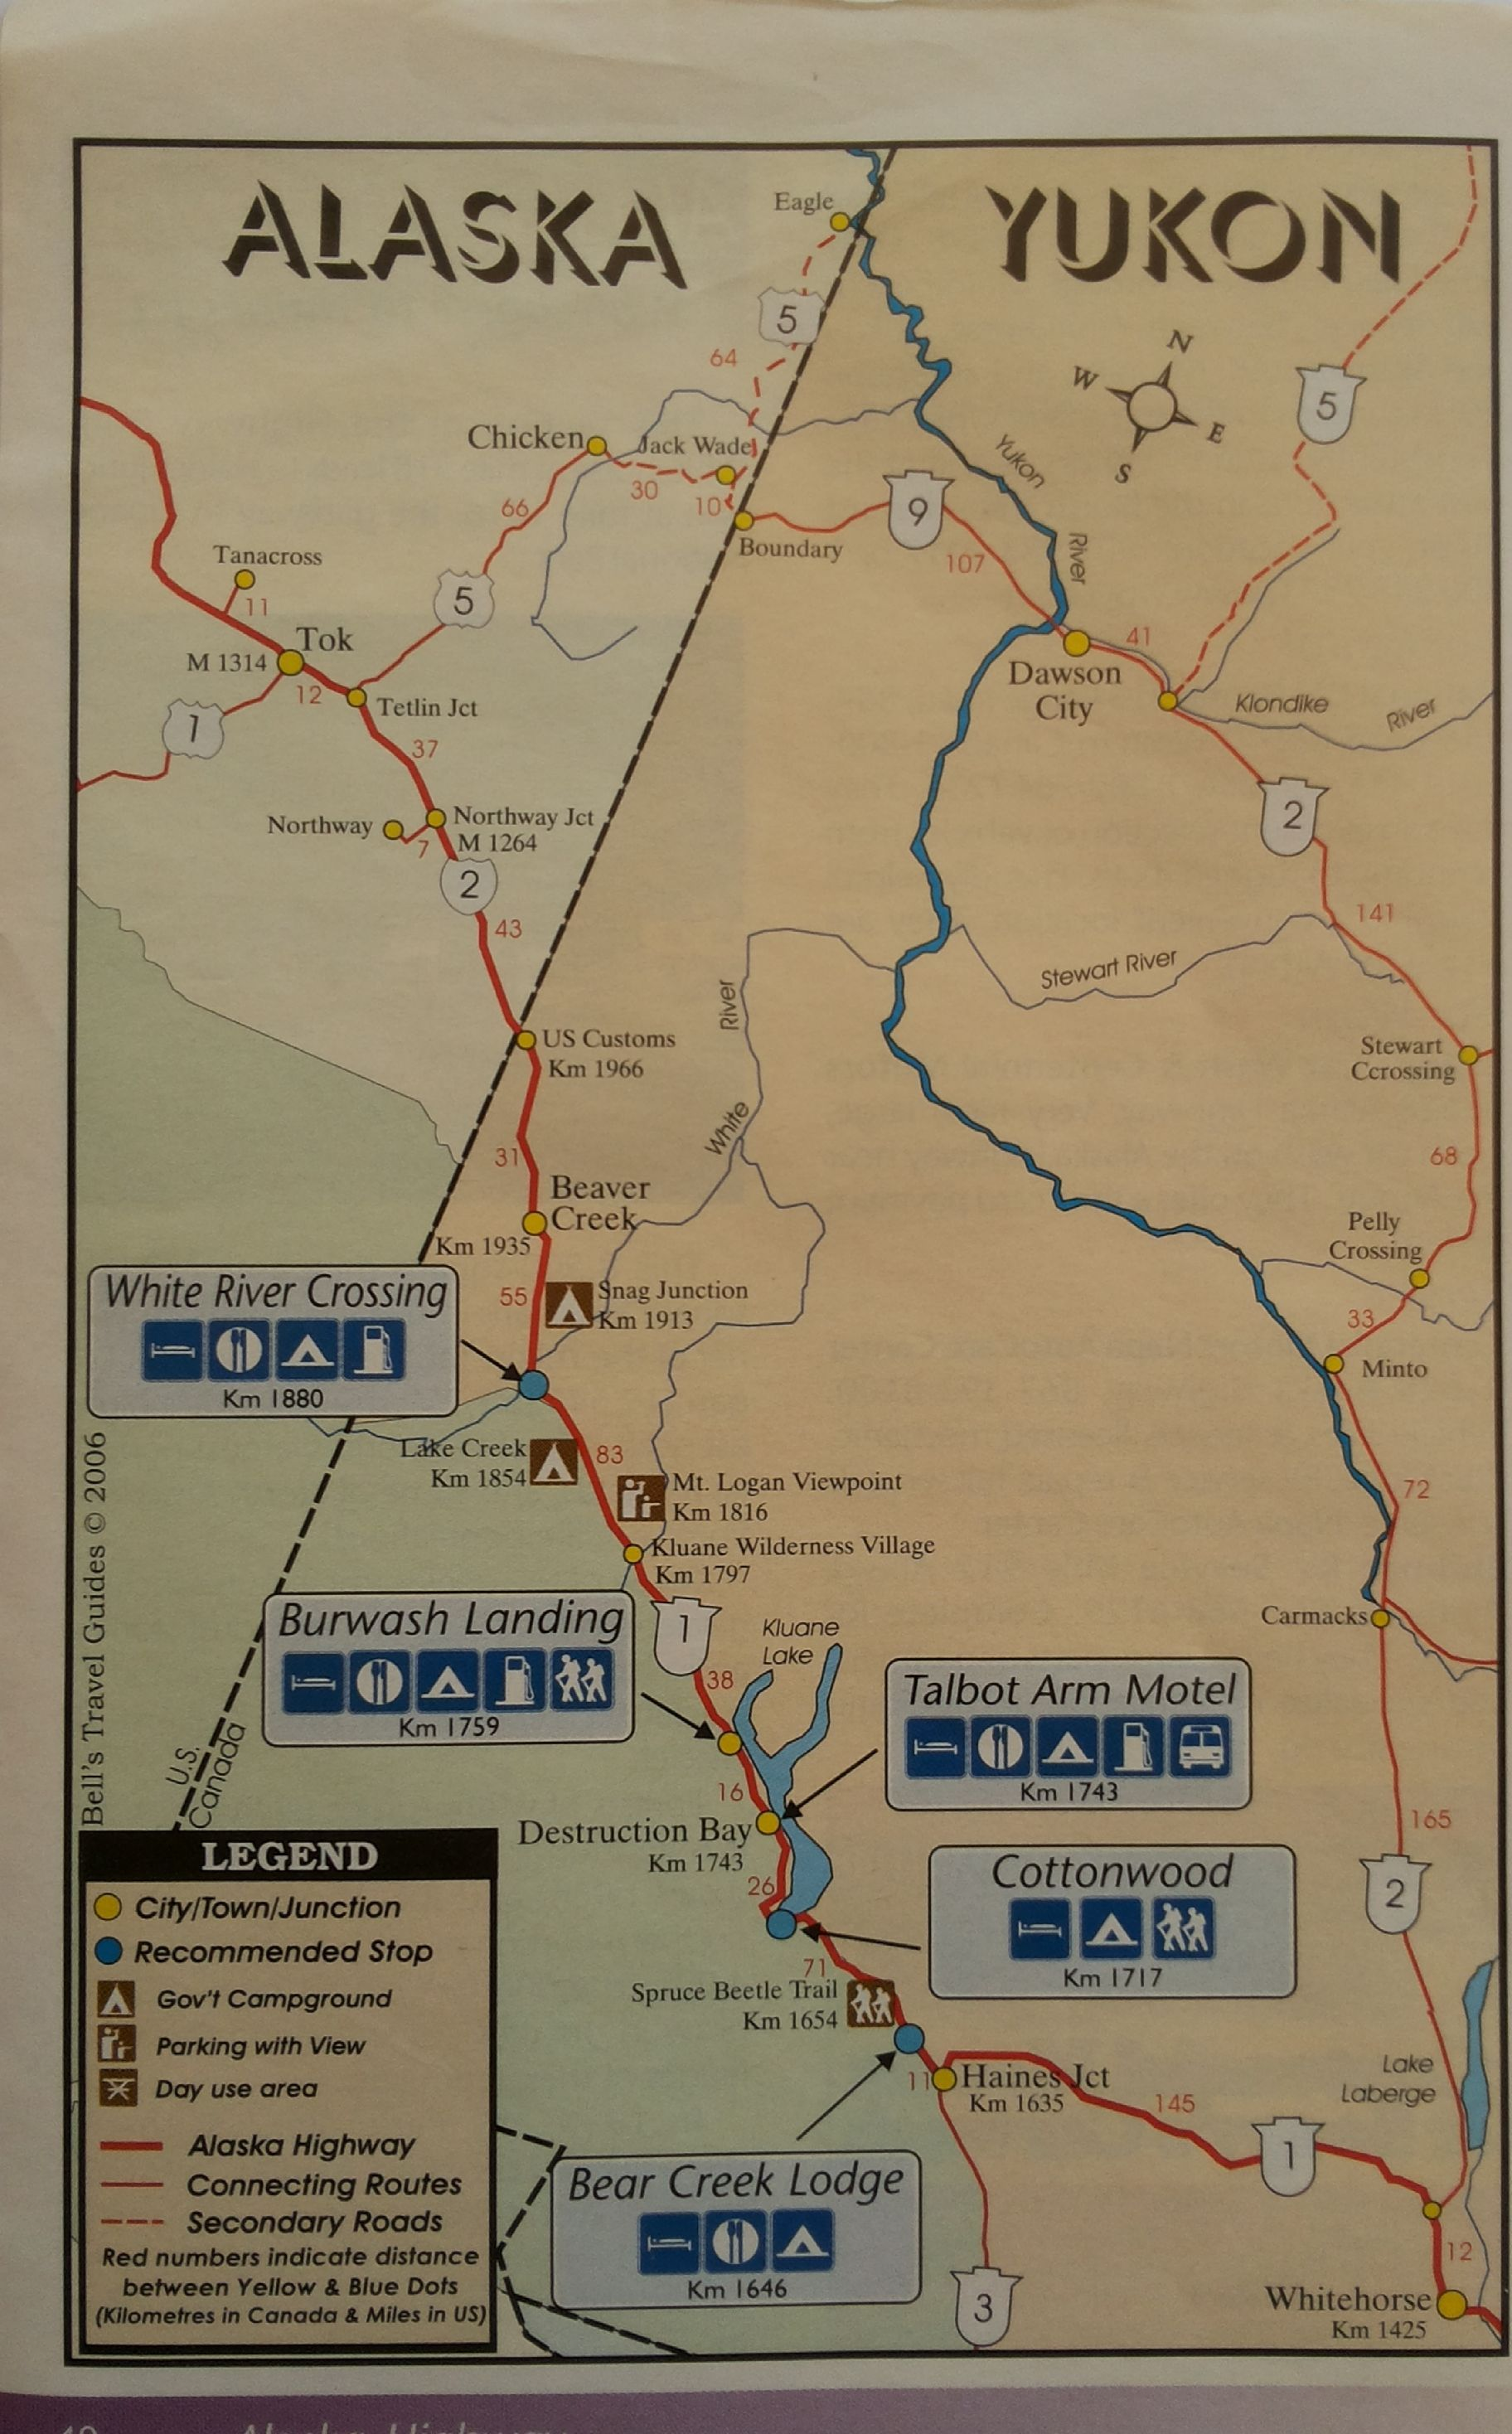 Alaska Yukon Map Drive From Whitehorse To Inuvik Nw Territories